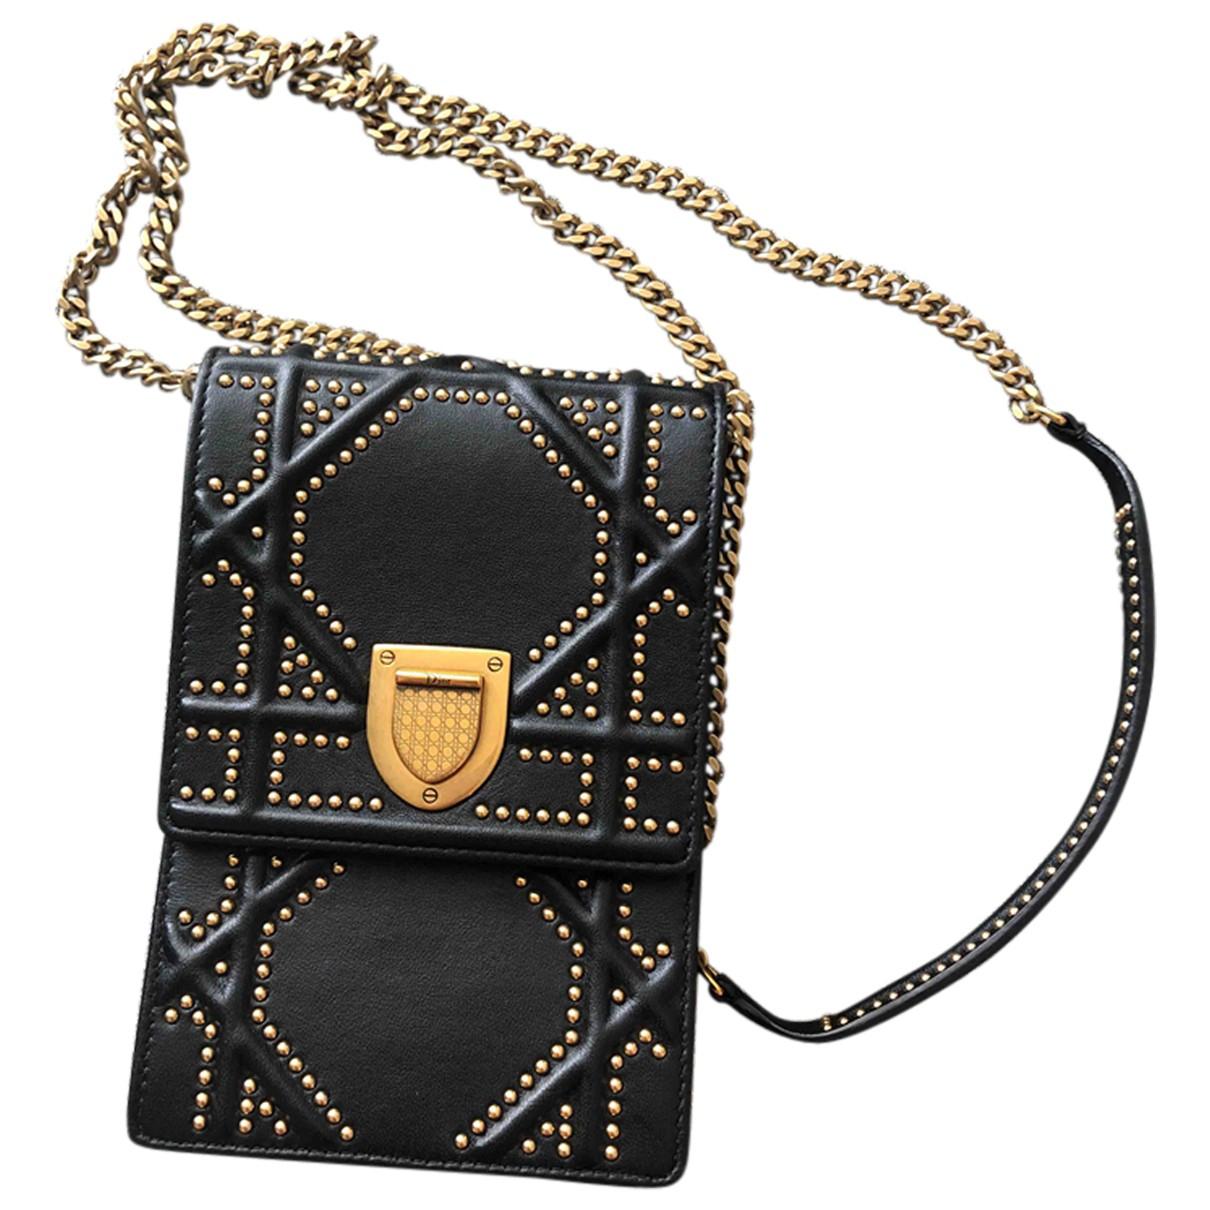 Dior Diorama Black Leather Clutch bag for Women N